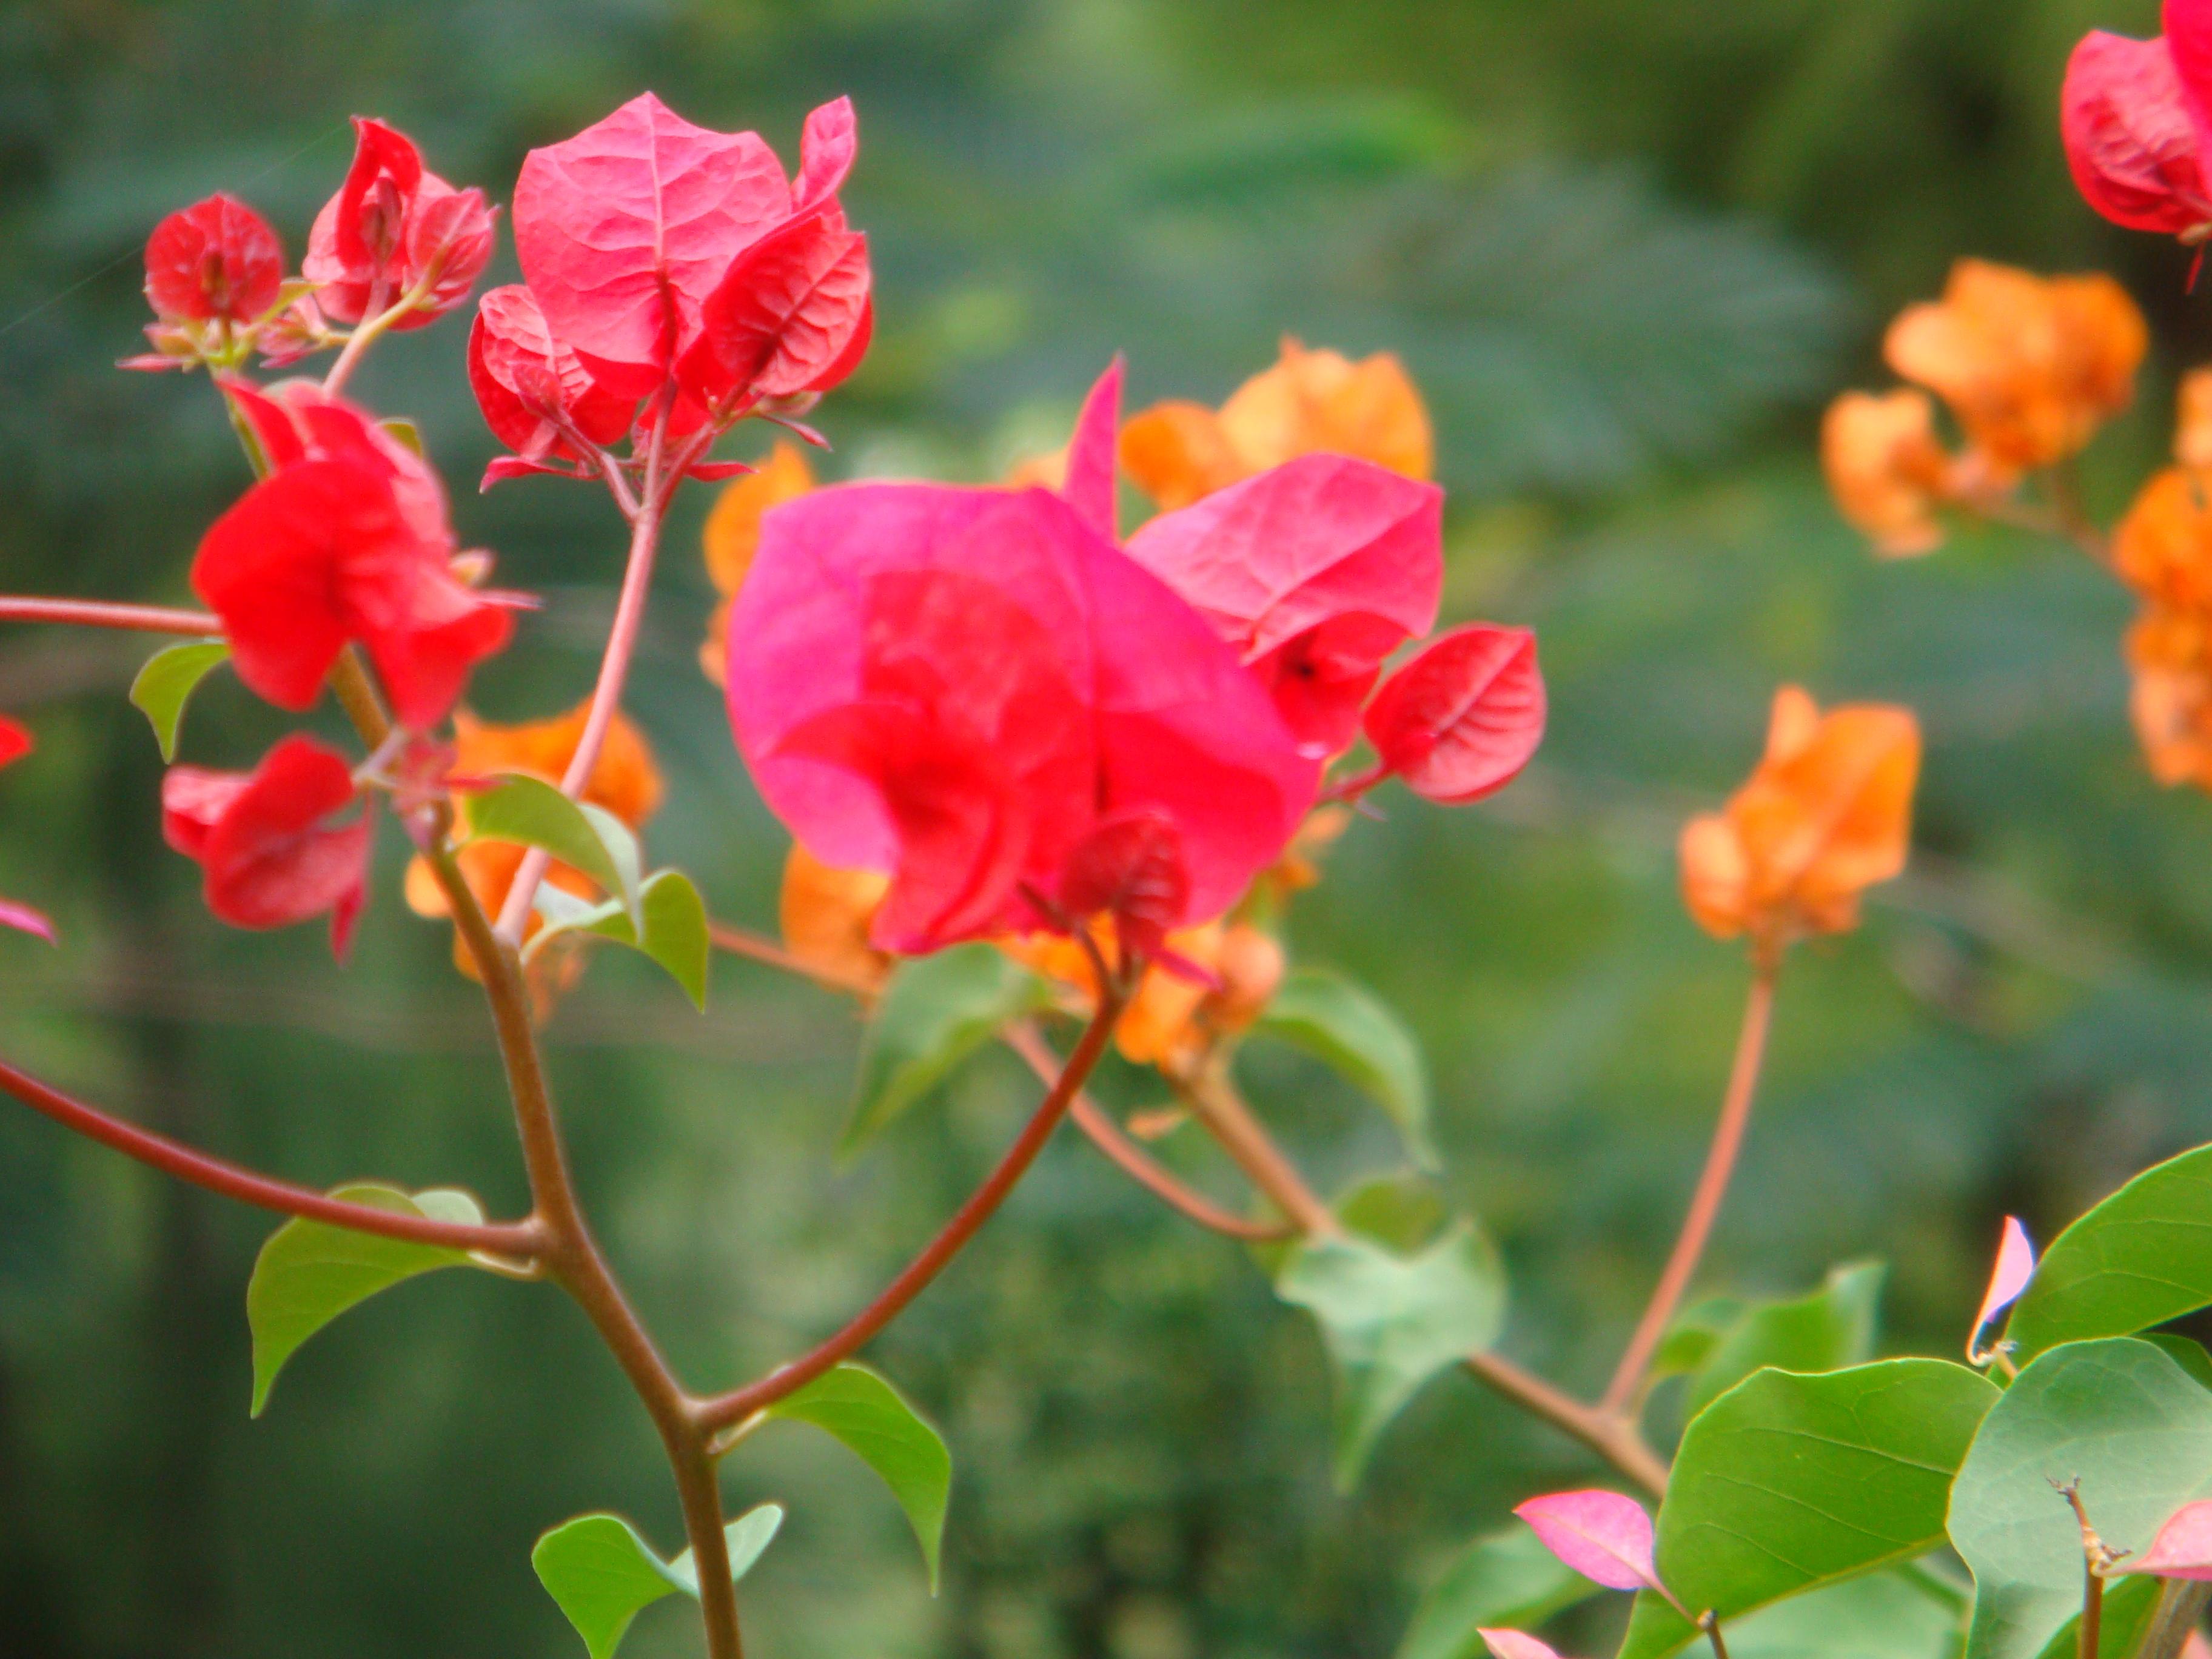 Caribbean Flowers: Things We Don't Normally See « Elissa Elliott